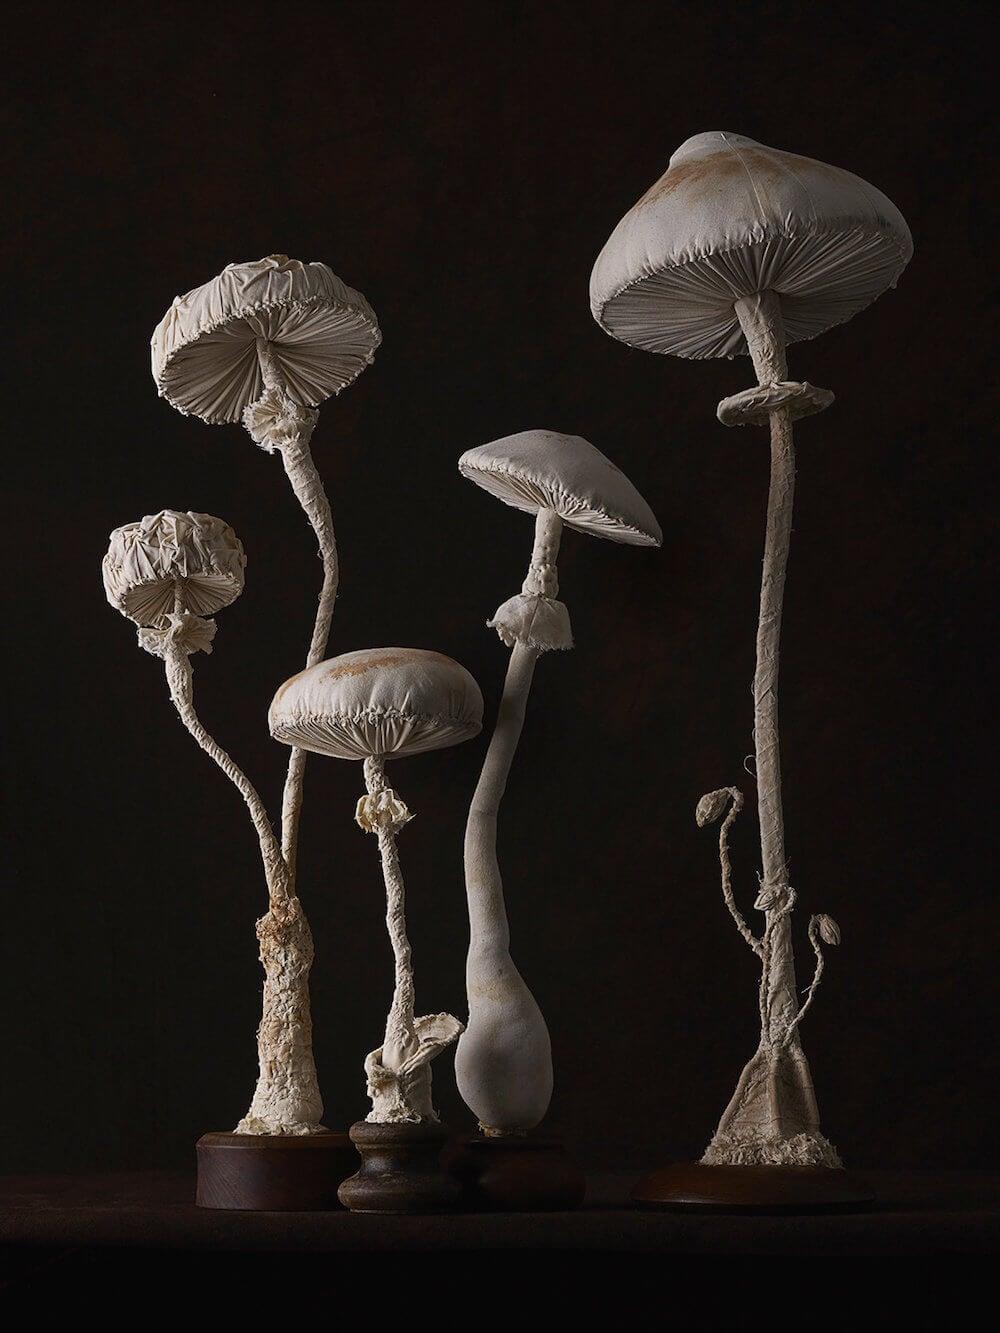 toadstool-sculptures-mister-finch-freeyork-8